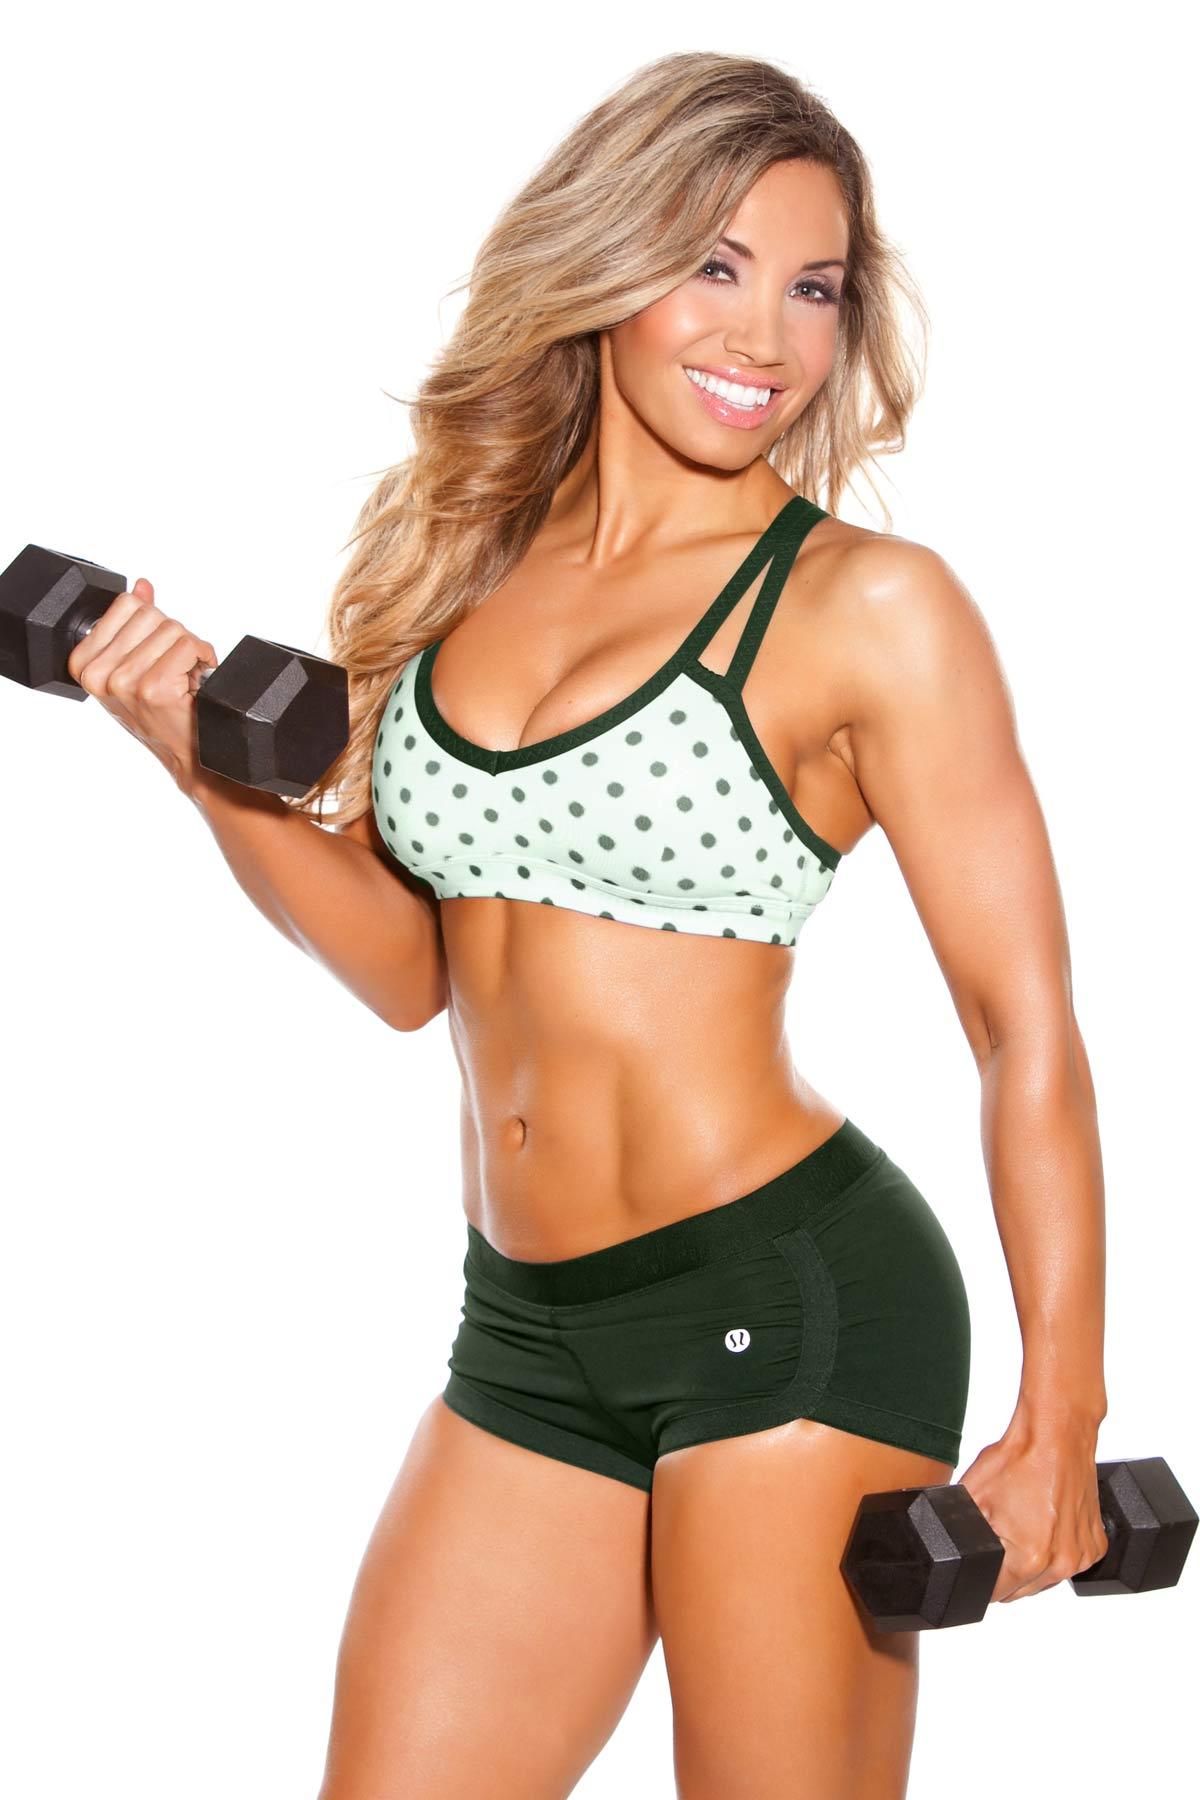 Lyzabeth Lopez Canadian Fitness Model